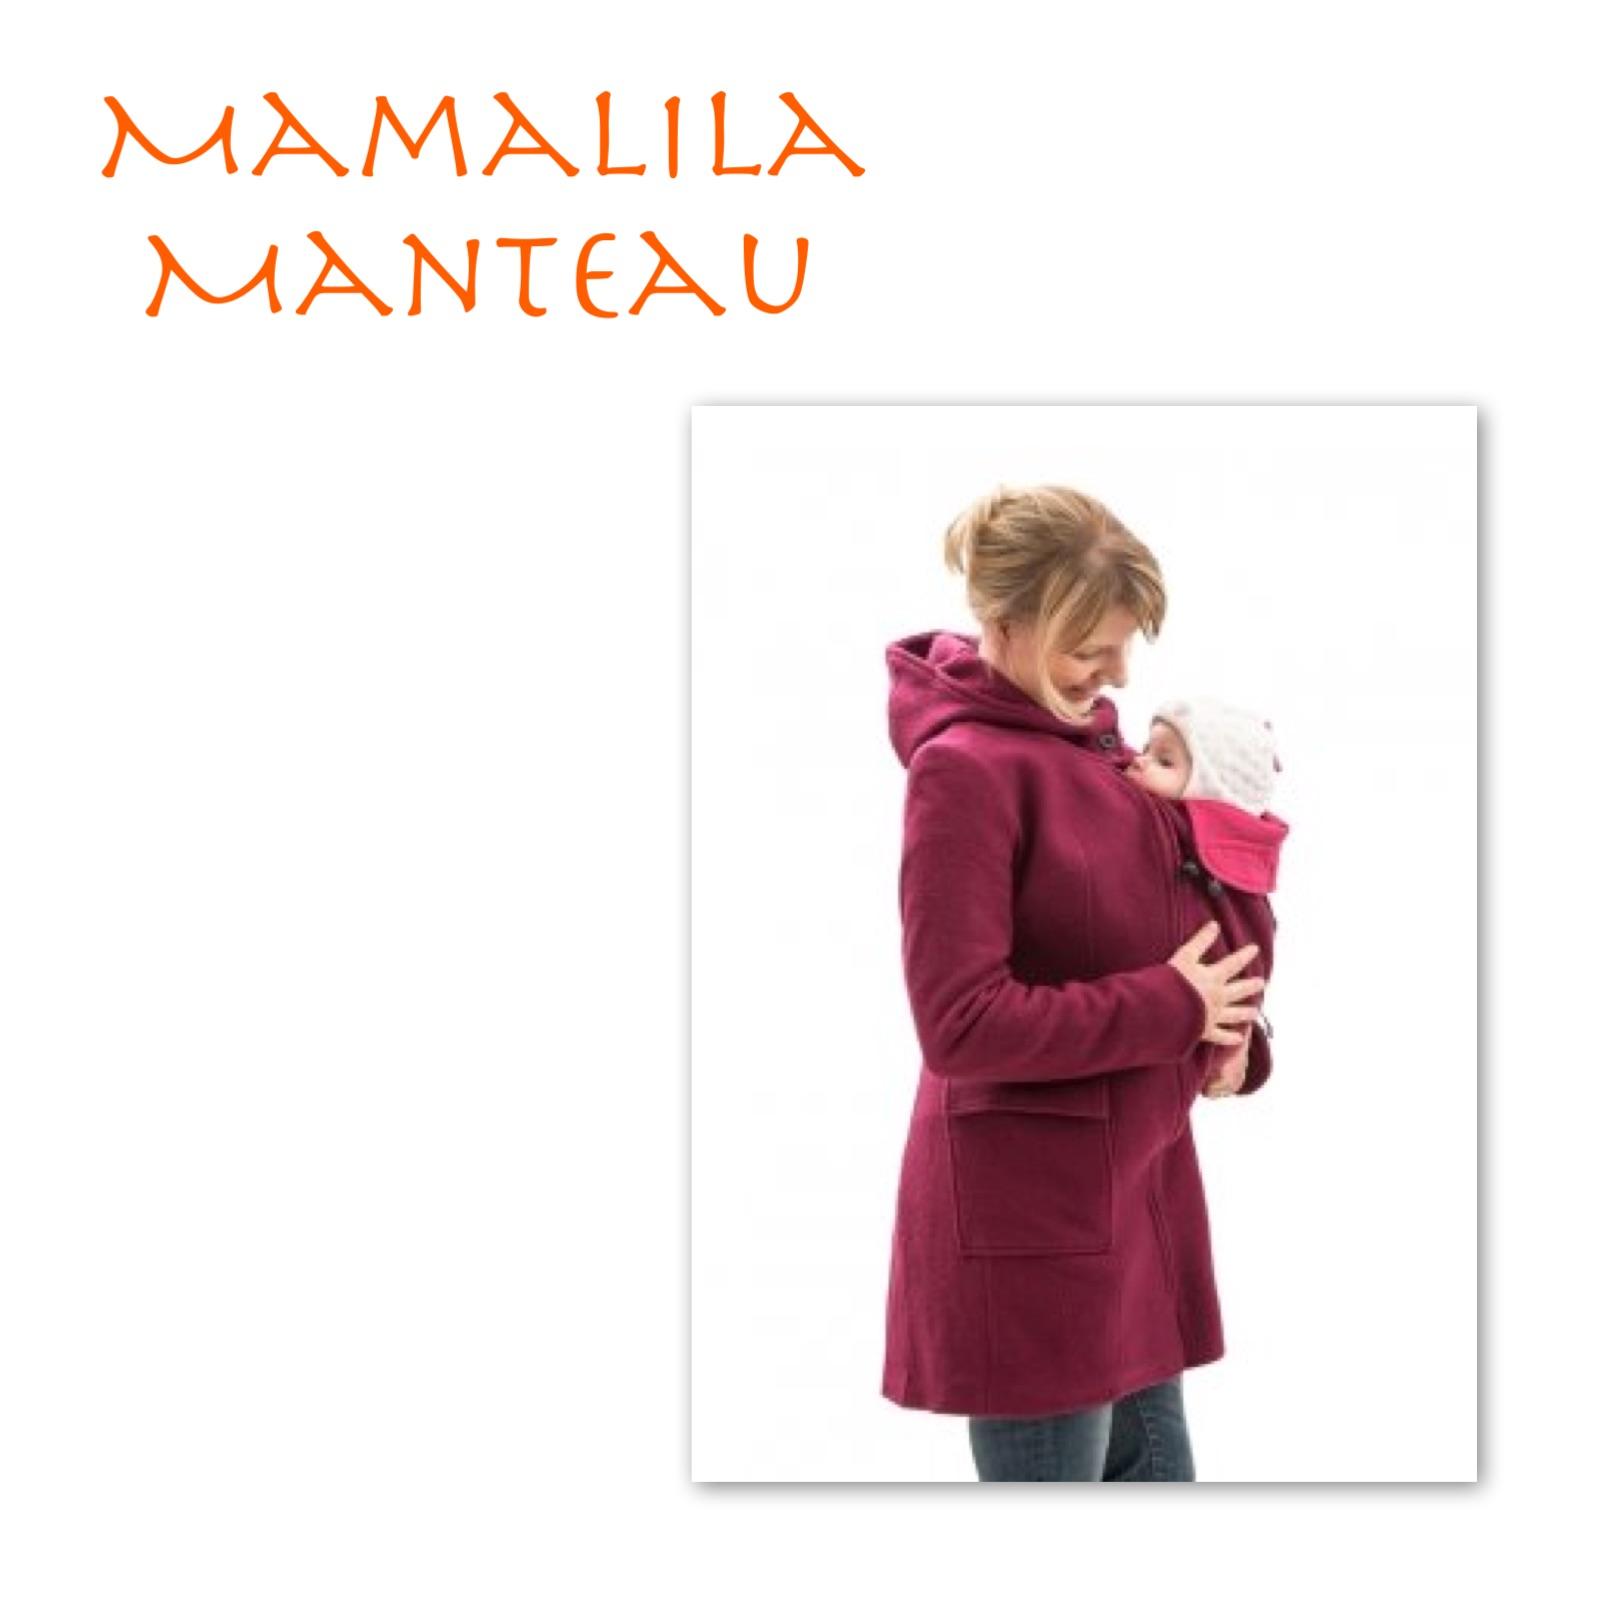 Mamalila Manteau